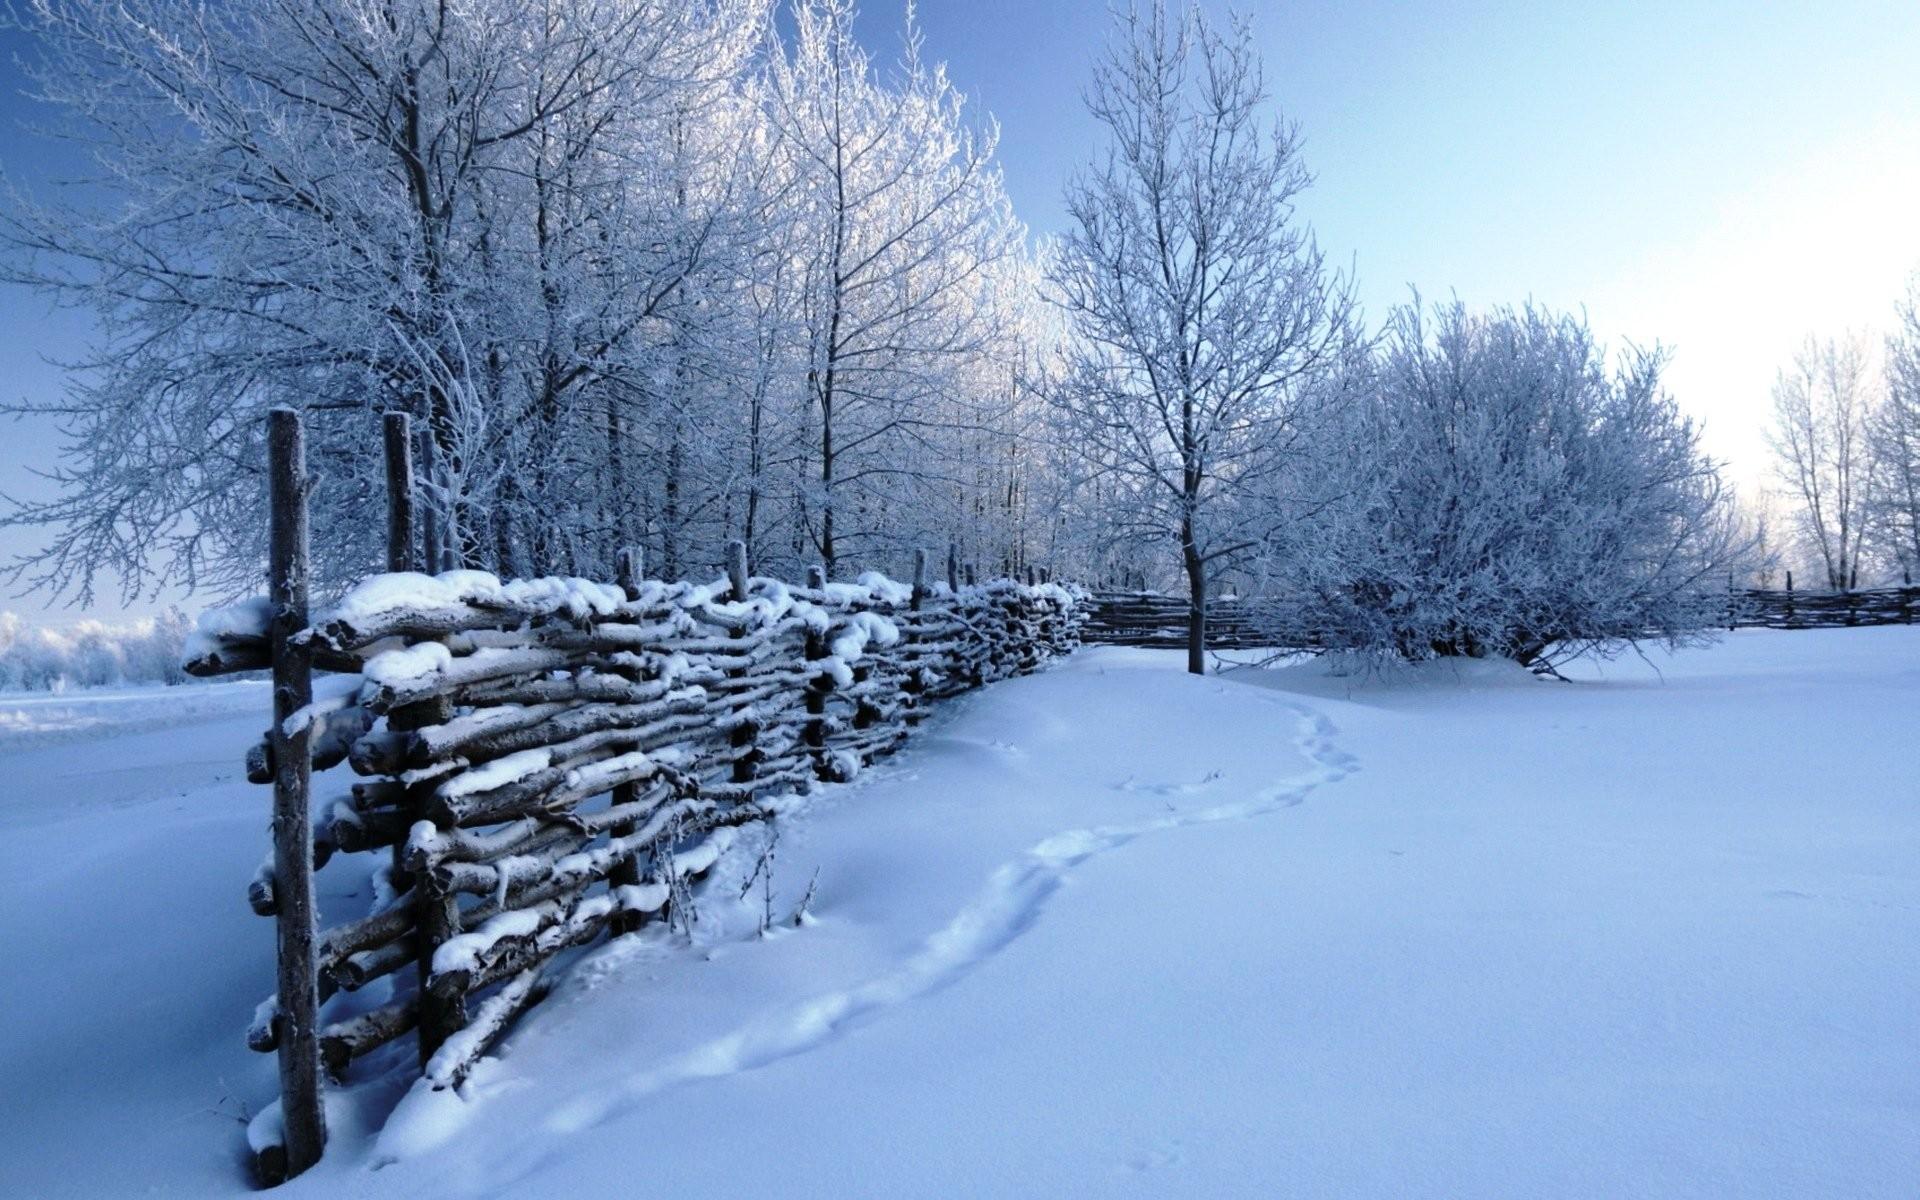 winter snow scenes wallpaper 183��